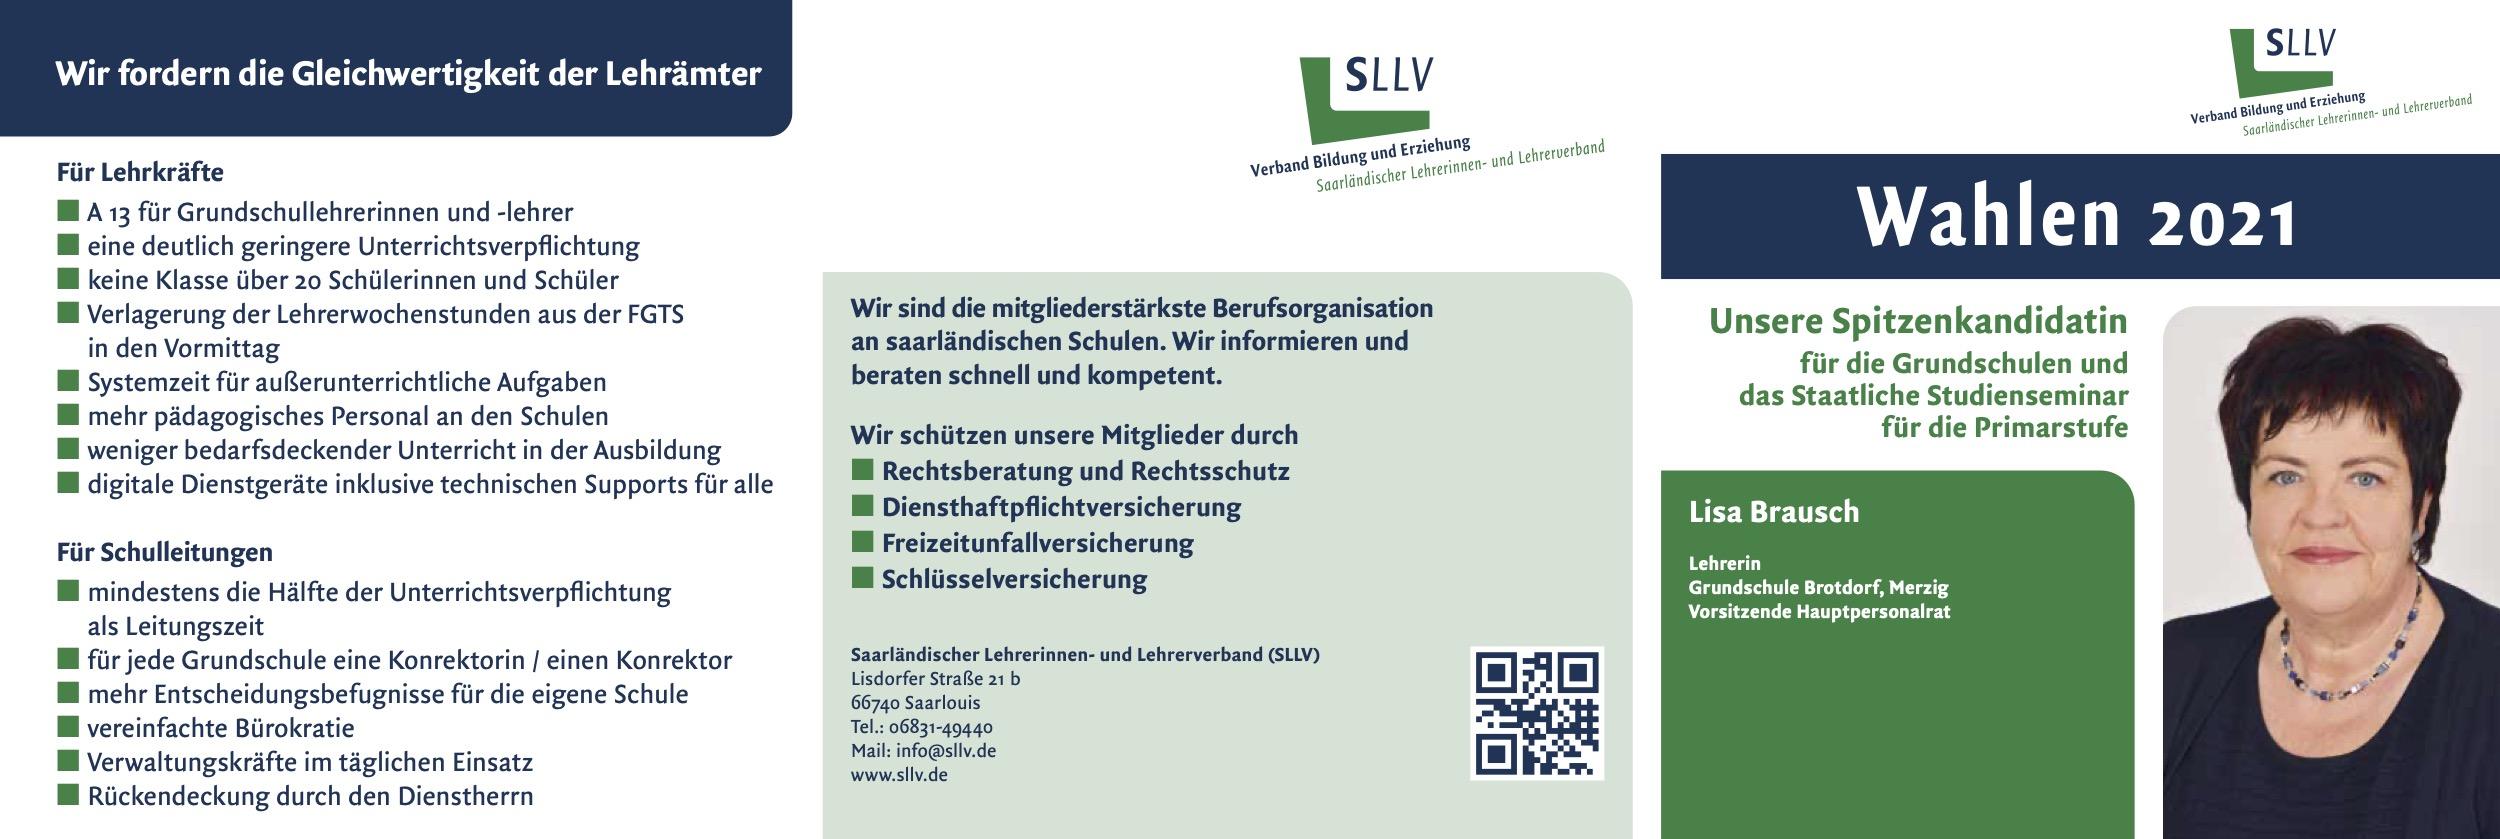 sllv_fly_PRwahlen_grundschule_2021_01